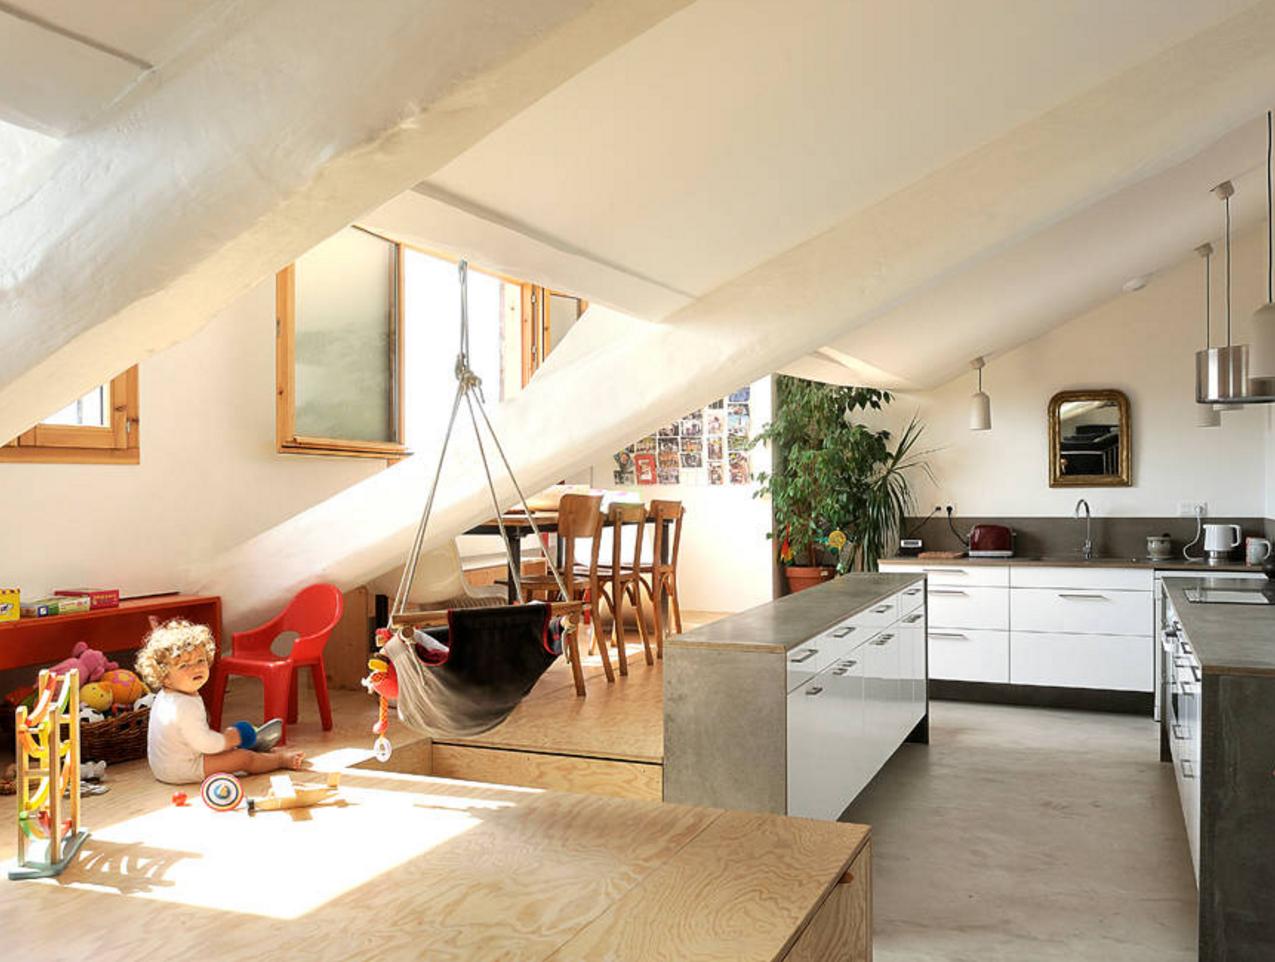 Idee per arredare una zona living a poco prezzo - Arredare casa a poco prezzo ...